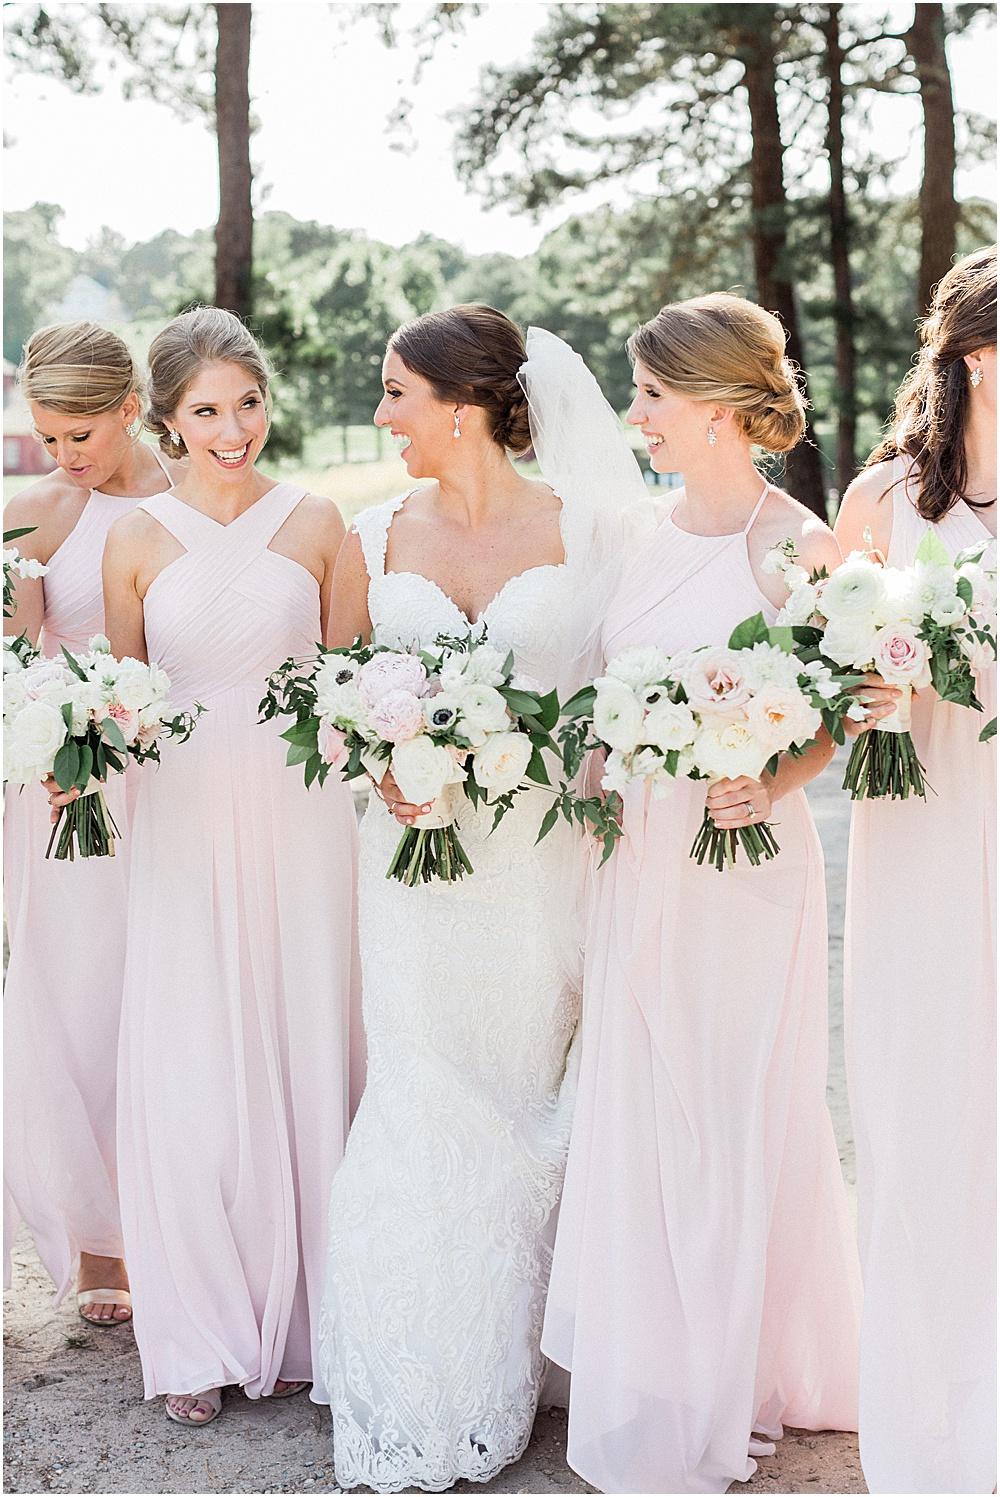 willowbend_country_club_colleen_brett_wild_dahlia_cw_events_cape_cod_massachusetts_boston_wedding_photographer_meredith_jane_photography_photo_0586.jpg